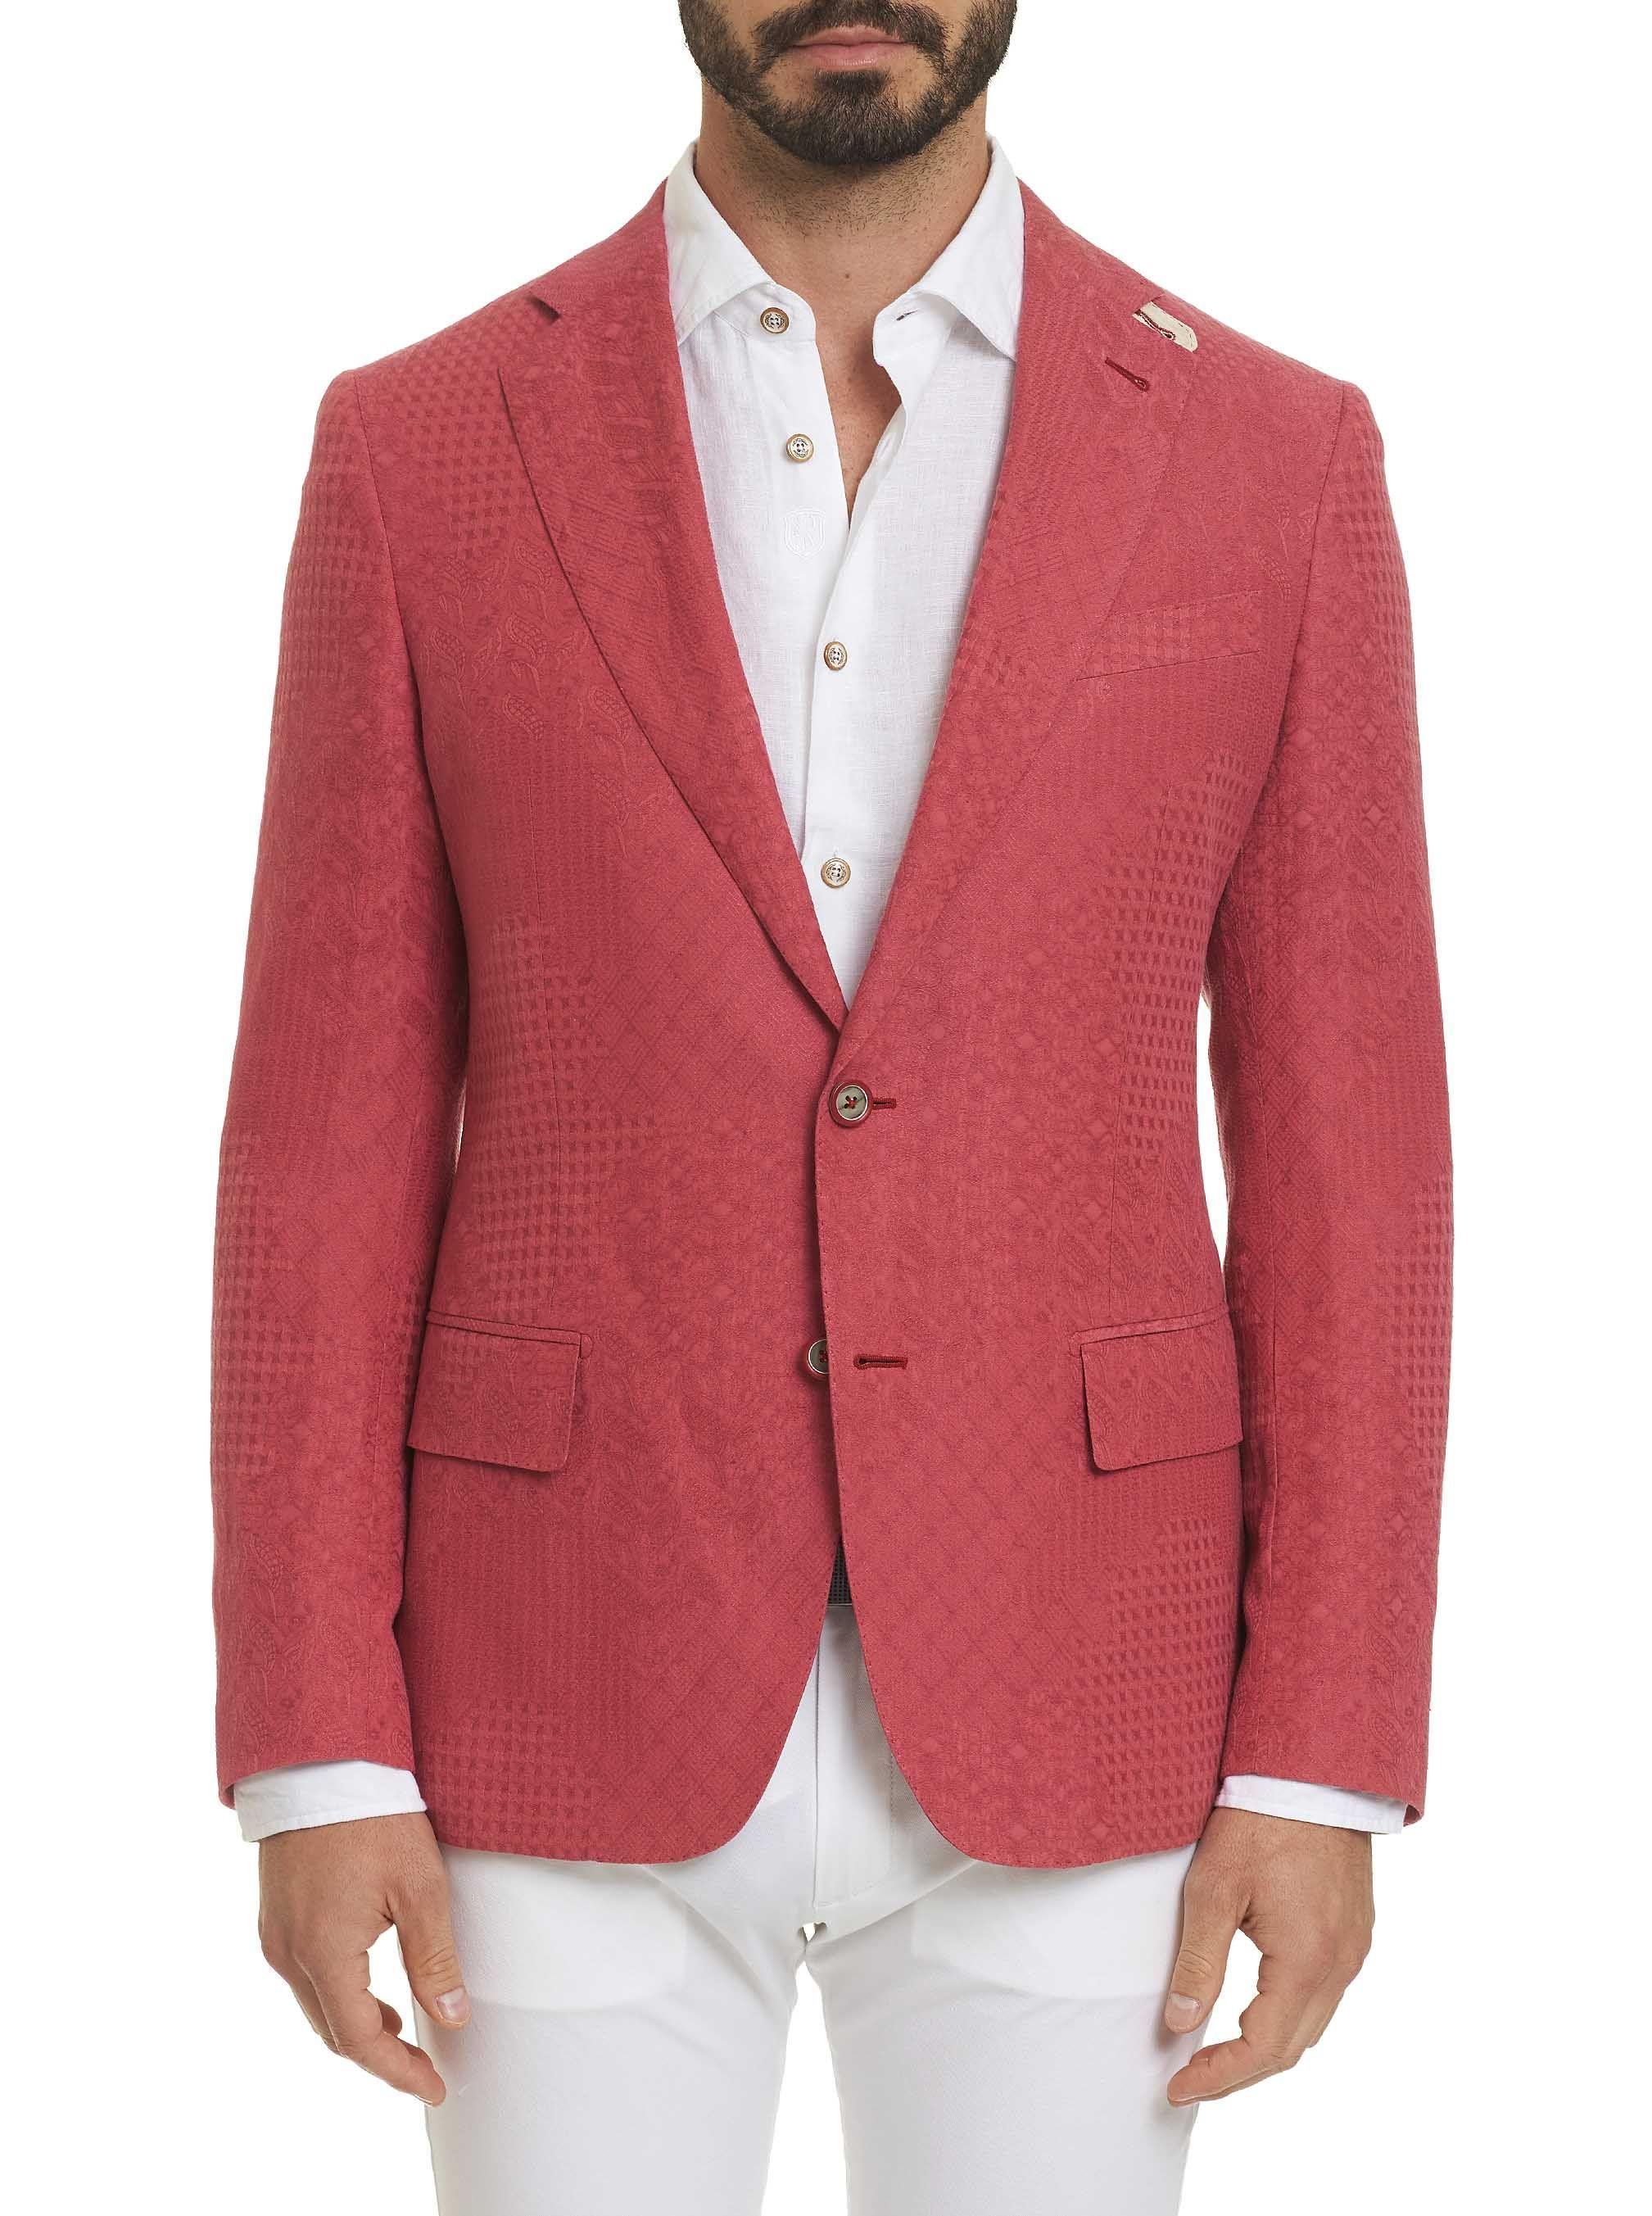 Robert Graham Men S R Collection Falco Sport Coat In Red Size 50r By Robert Graham Robertgraham Cloth Sport Coat Mens Sport Coat